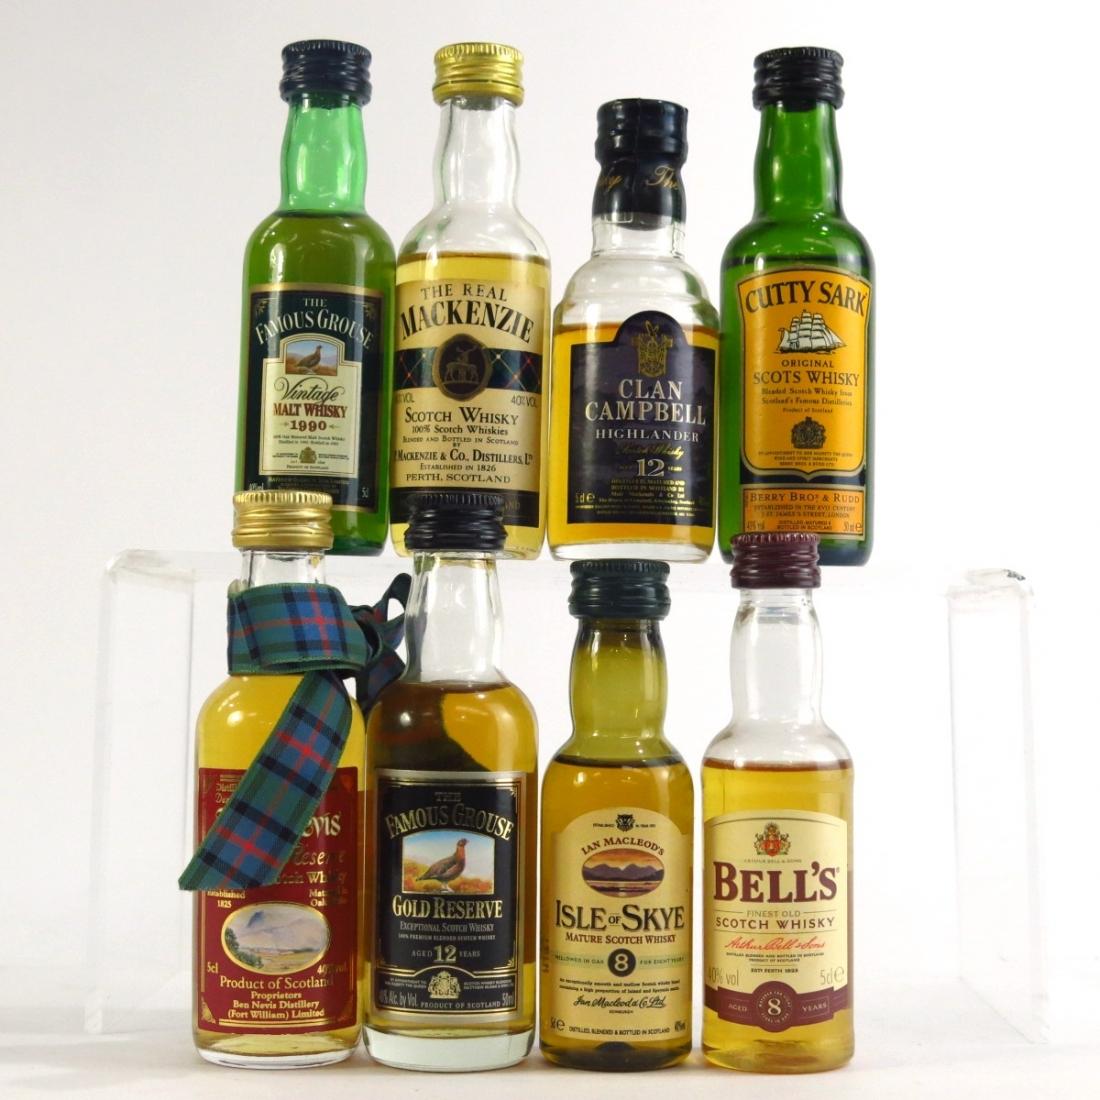 Scotch Whisky Miniature Selection 8 x 5cl